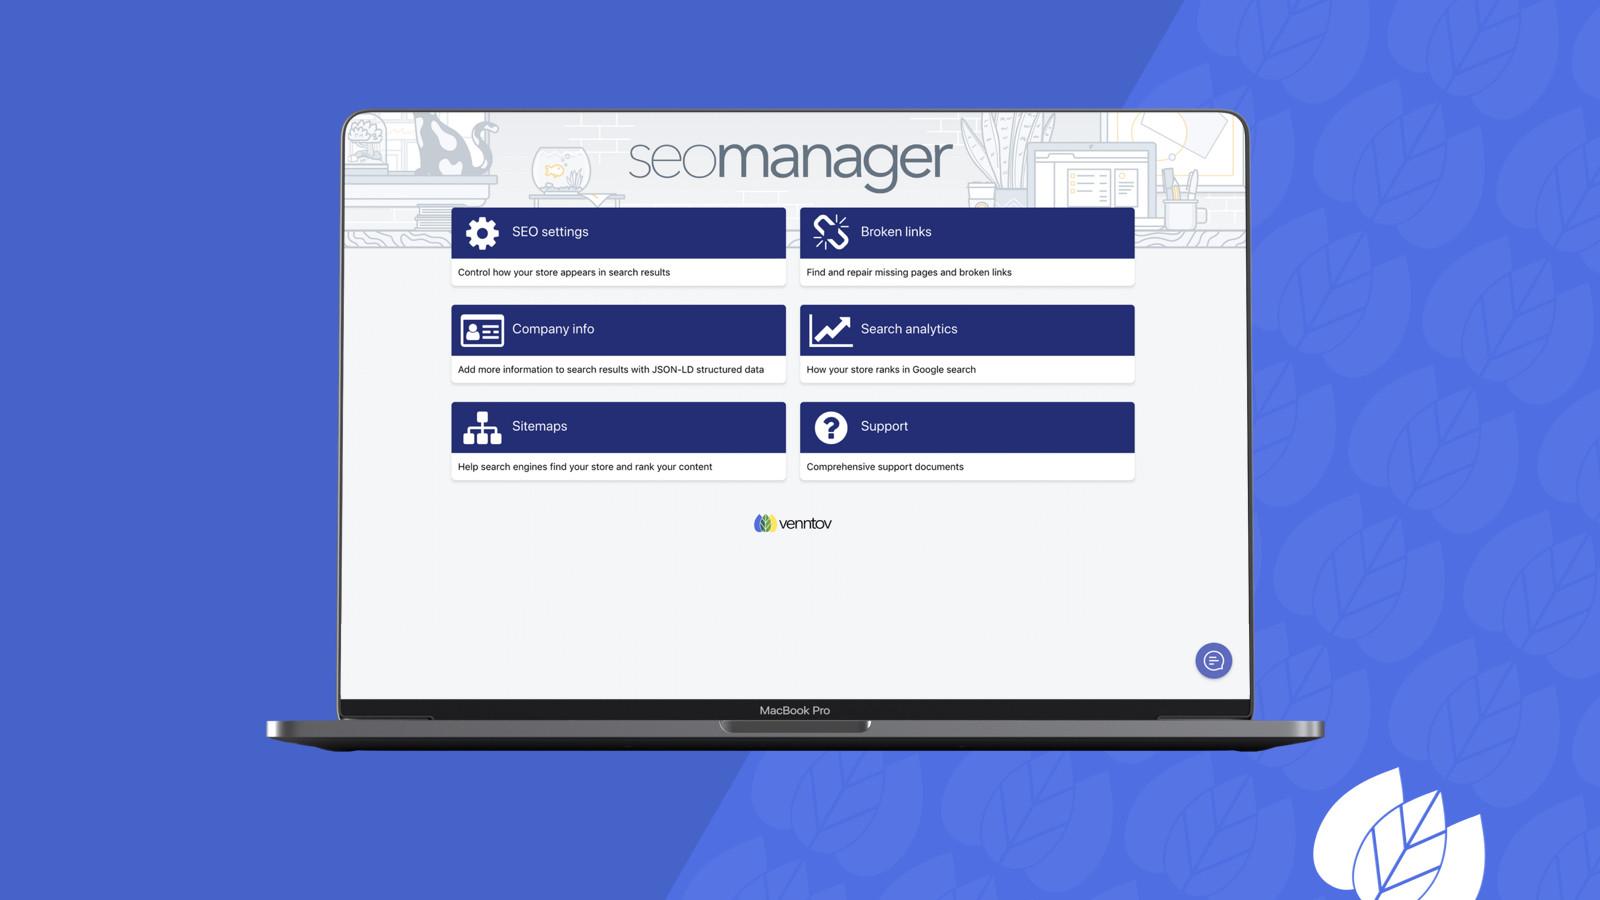 Intuitive SEO Manager desktop admin interface